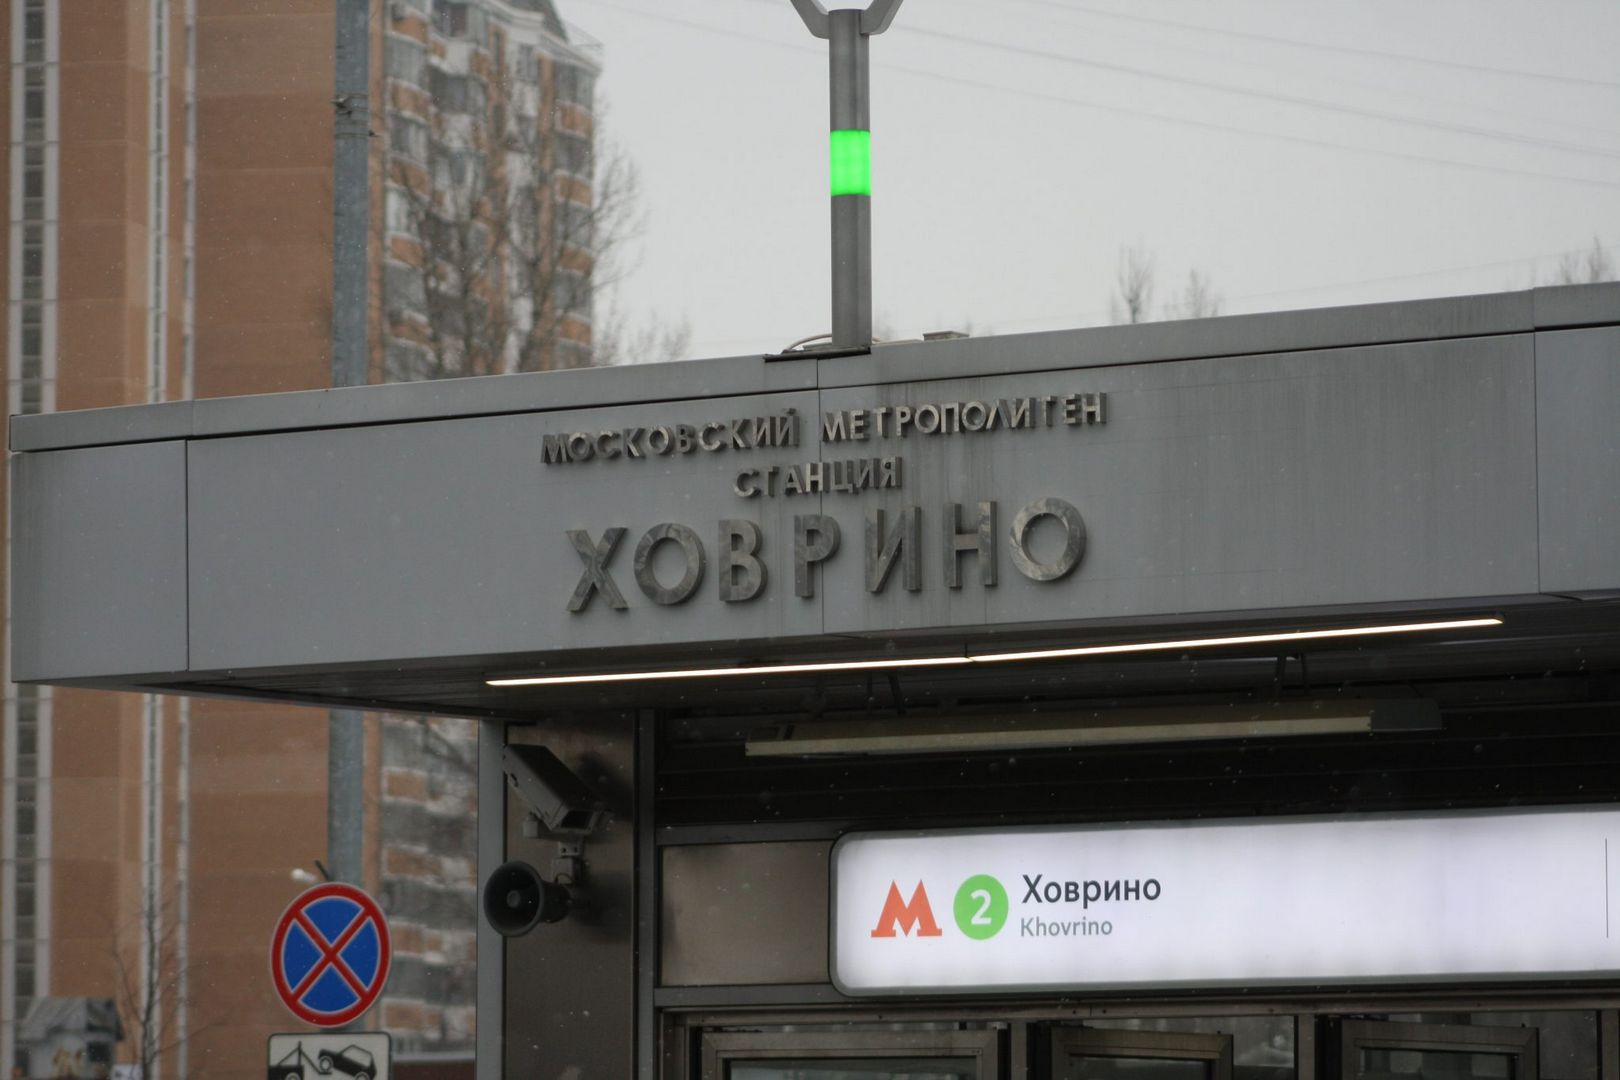 метро, благоустройство